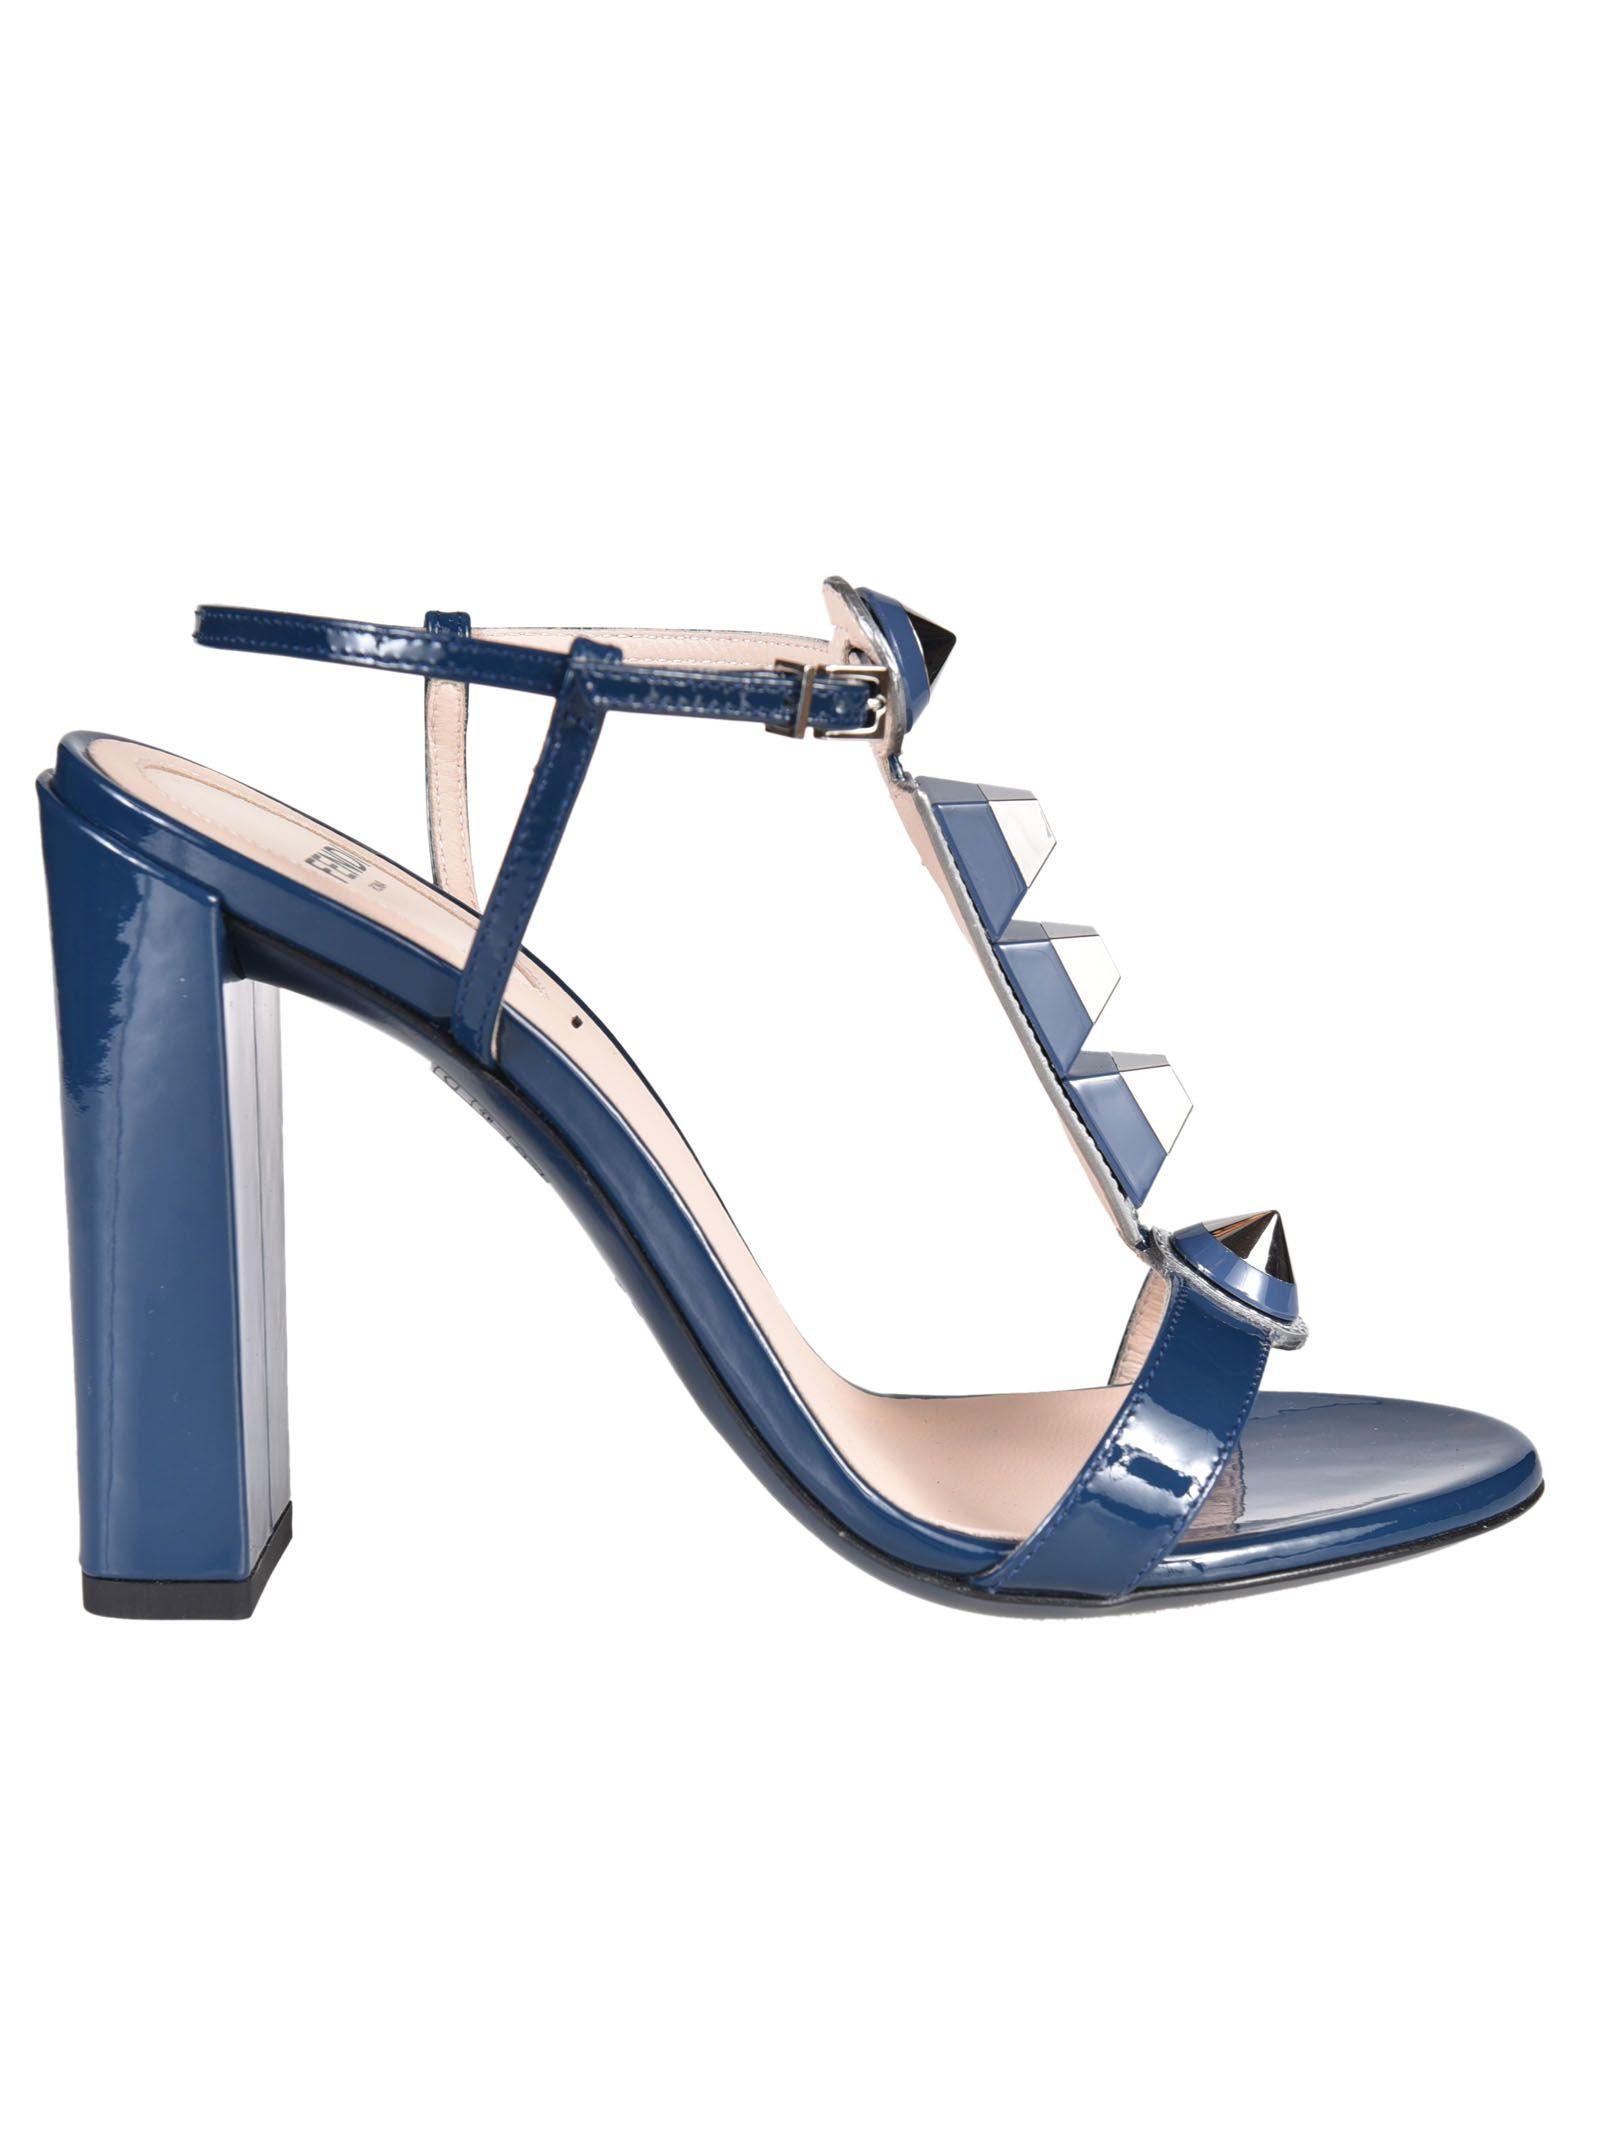 Fendi Studded Sandals